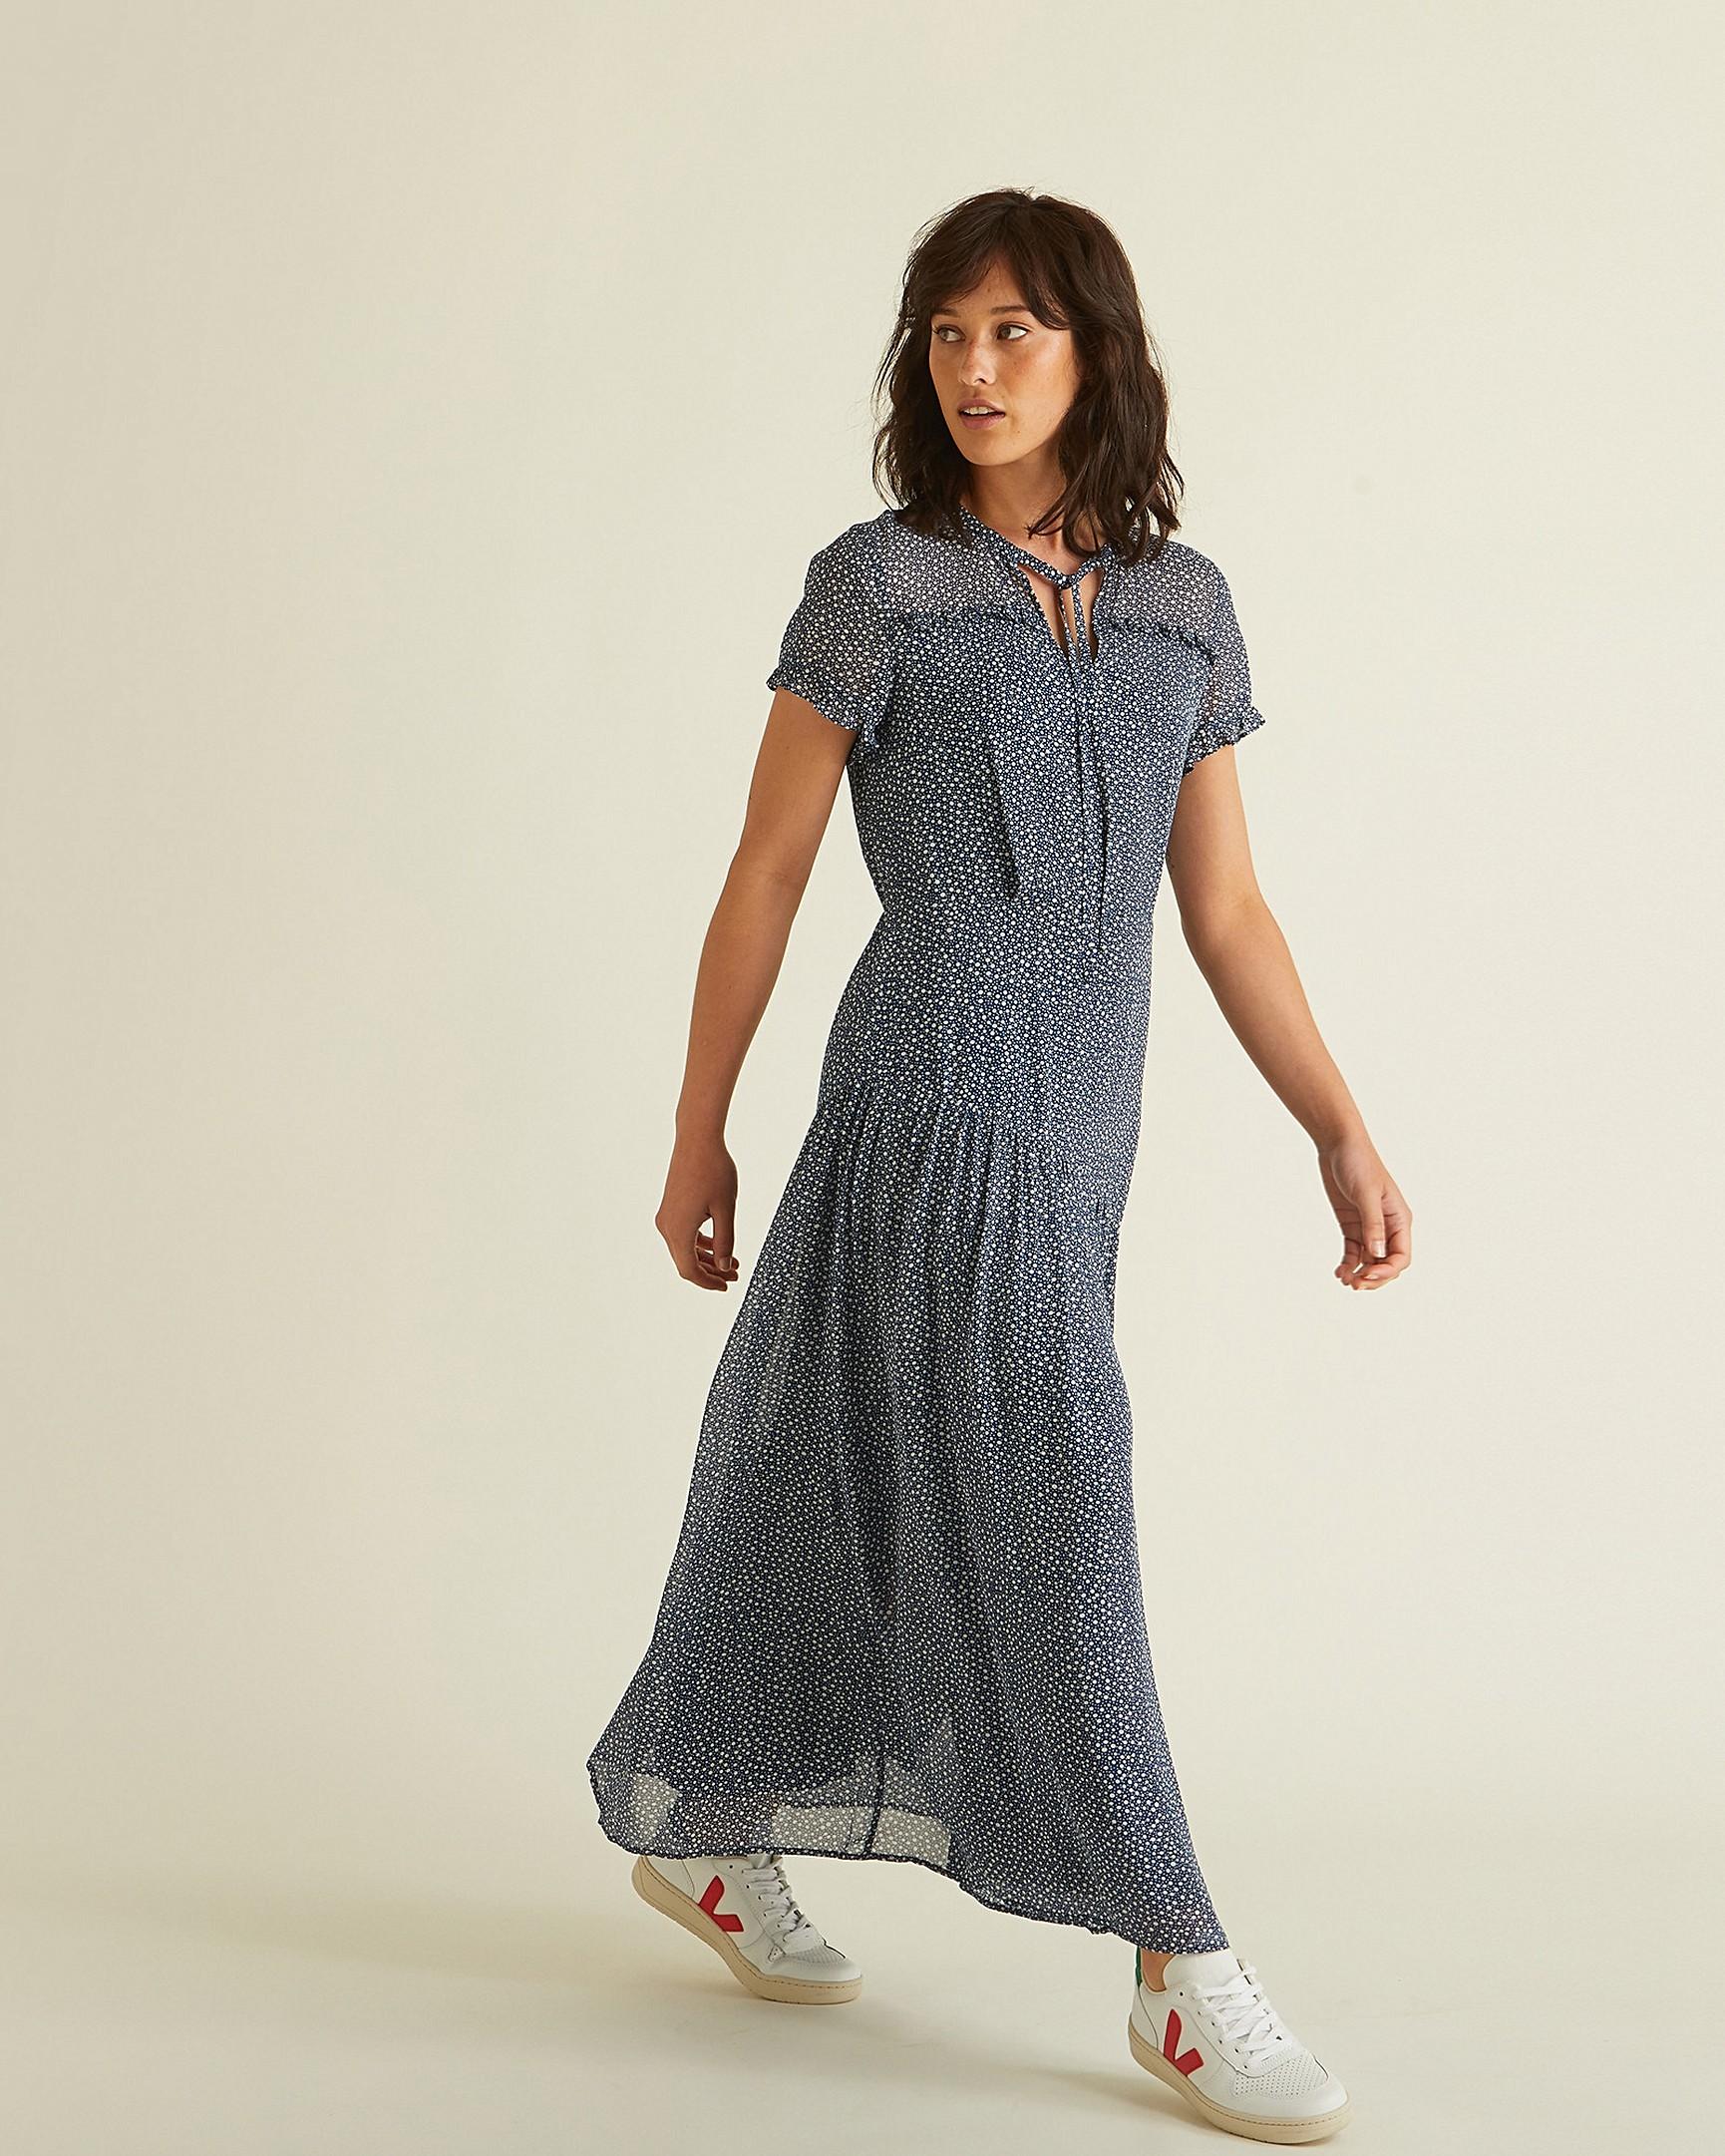 ea0c3f7db8ad5 Dresses for Women | Summer Dresses UK | Oliver Bonas